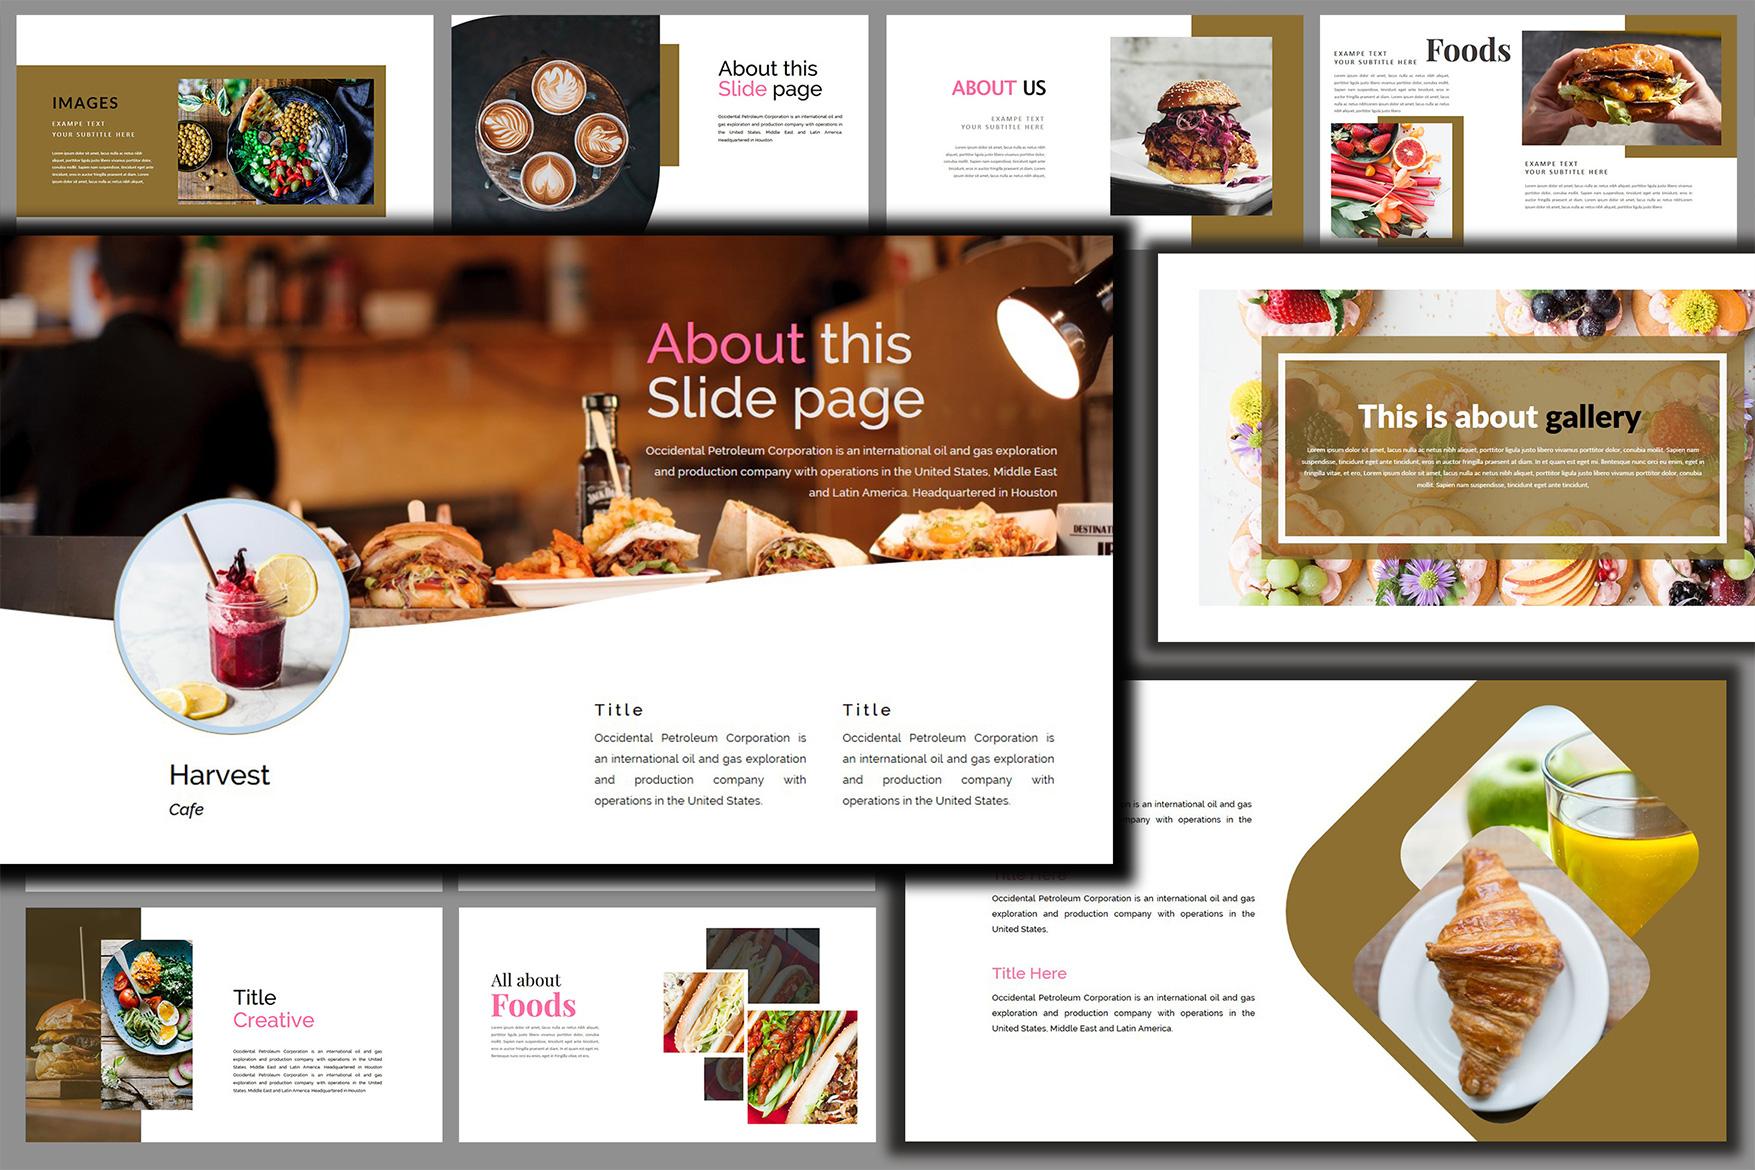 Delicious Food - Google Slides Presentation example image 3